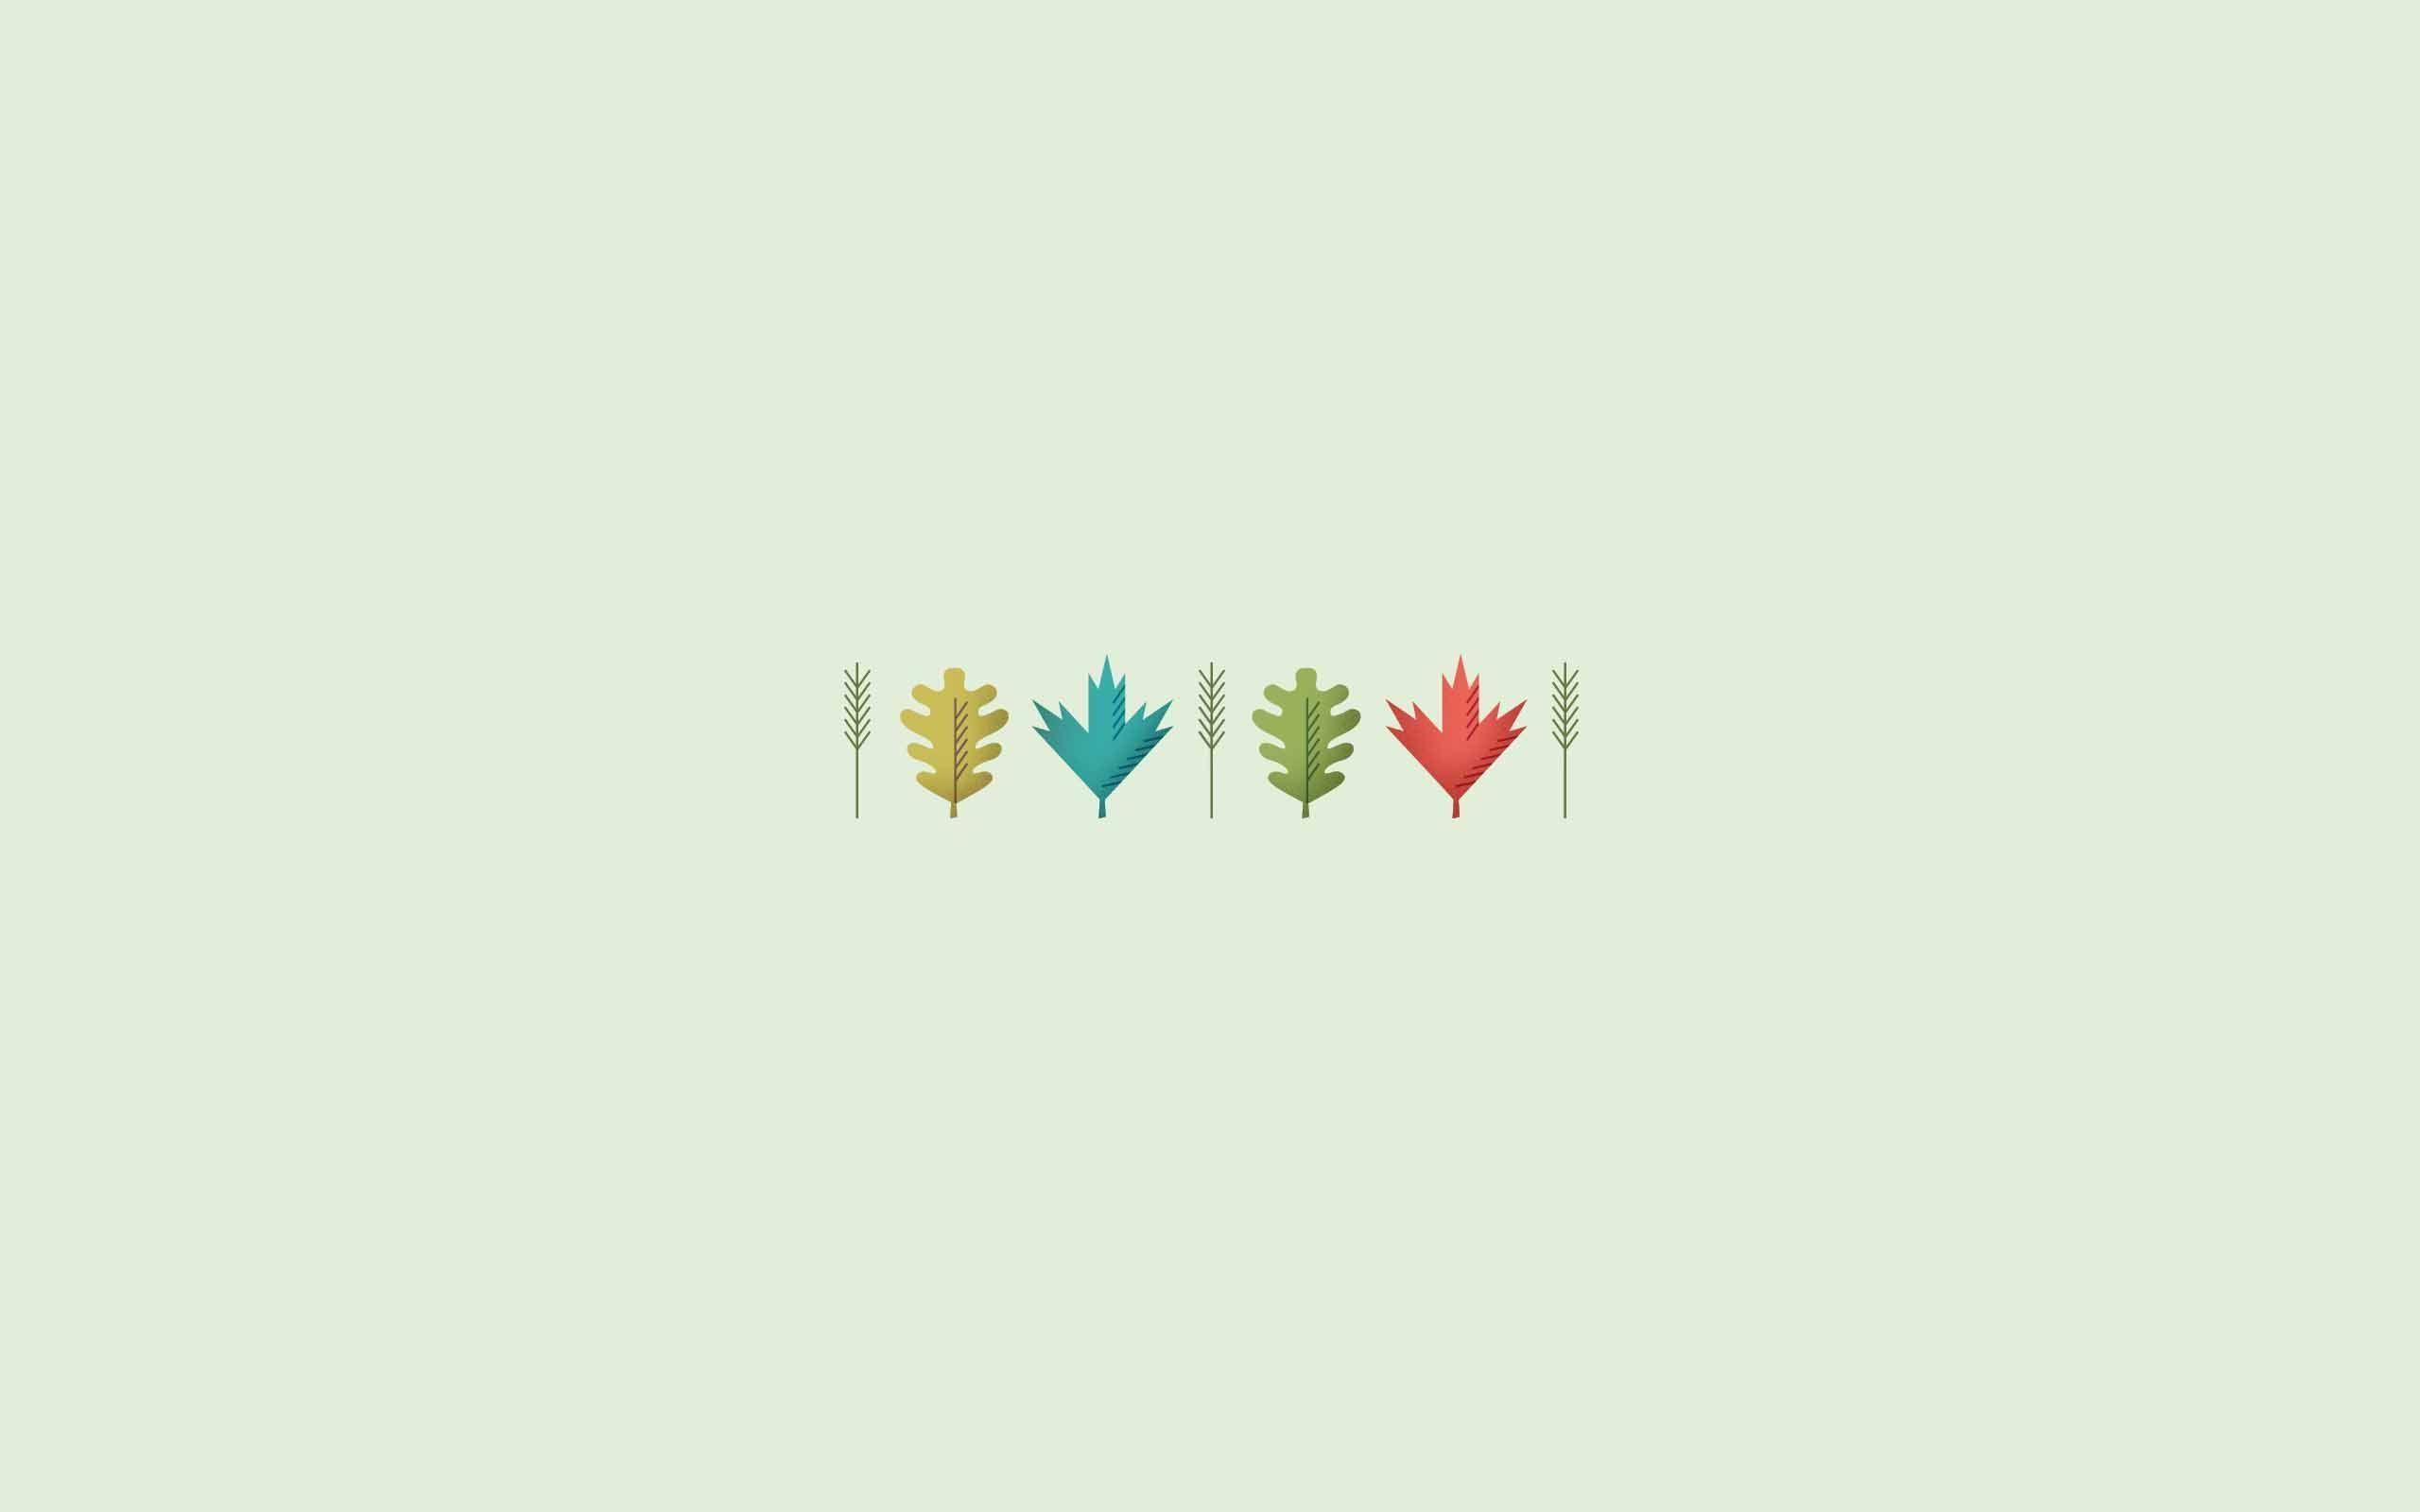 Cute Fall Wallpapers - Wallpaper Cave